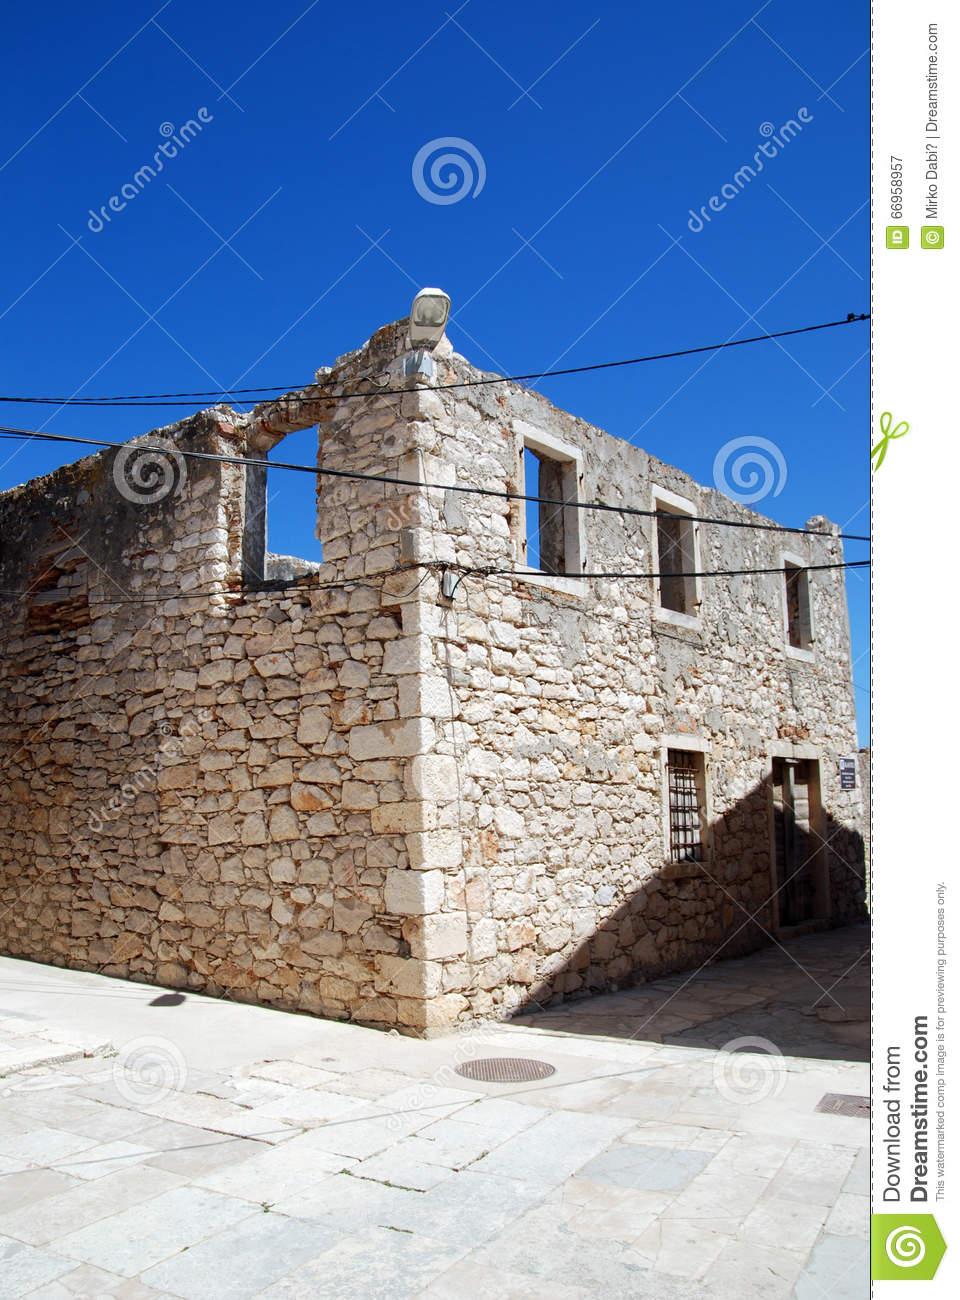 Abandoned Ruined House In Island Susak,Croatia Stock Photo.